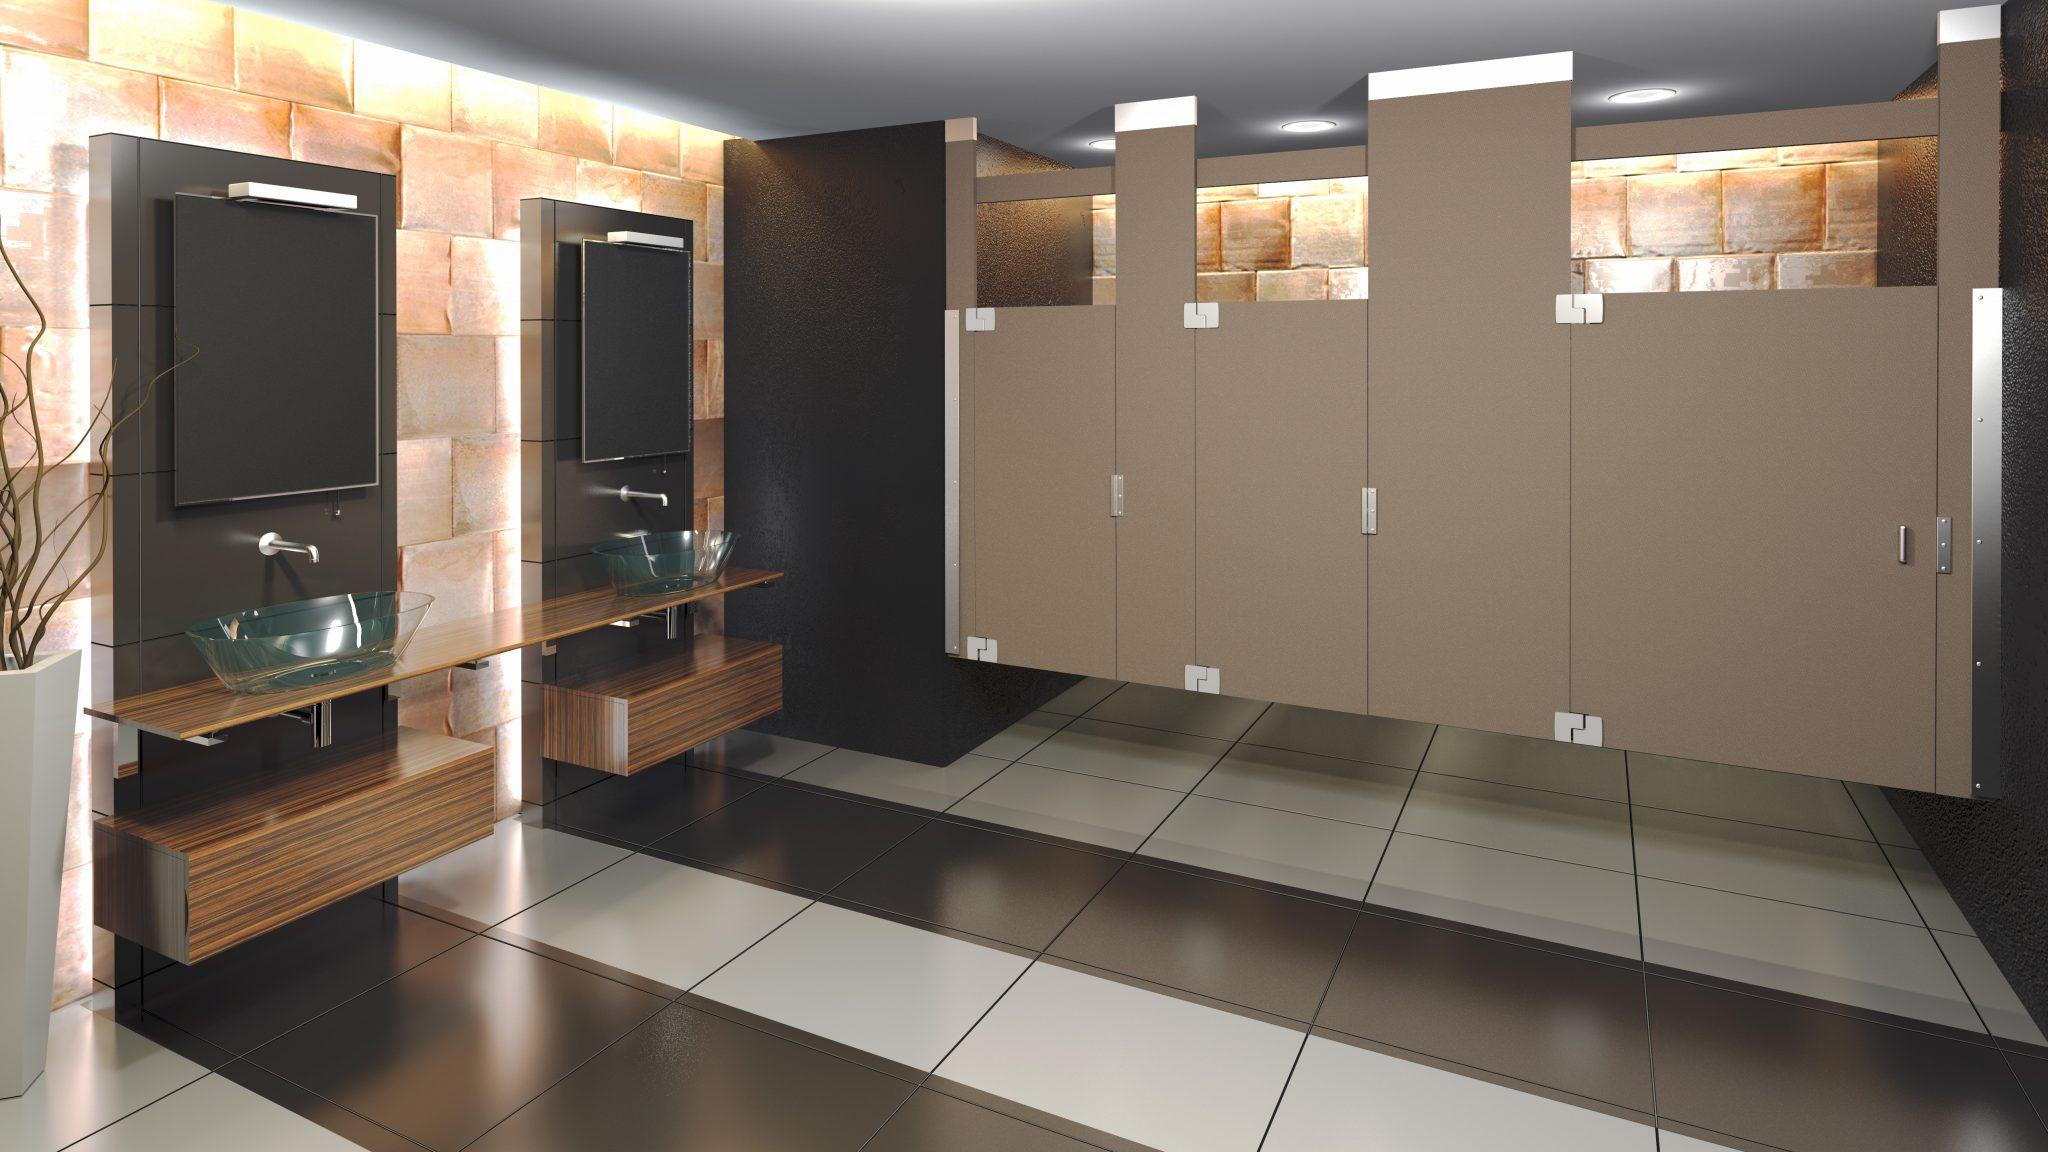 Configurations of Toilet Partitions - Scranton Products